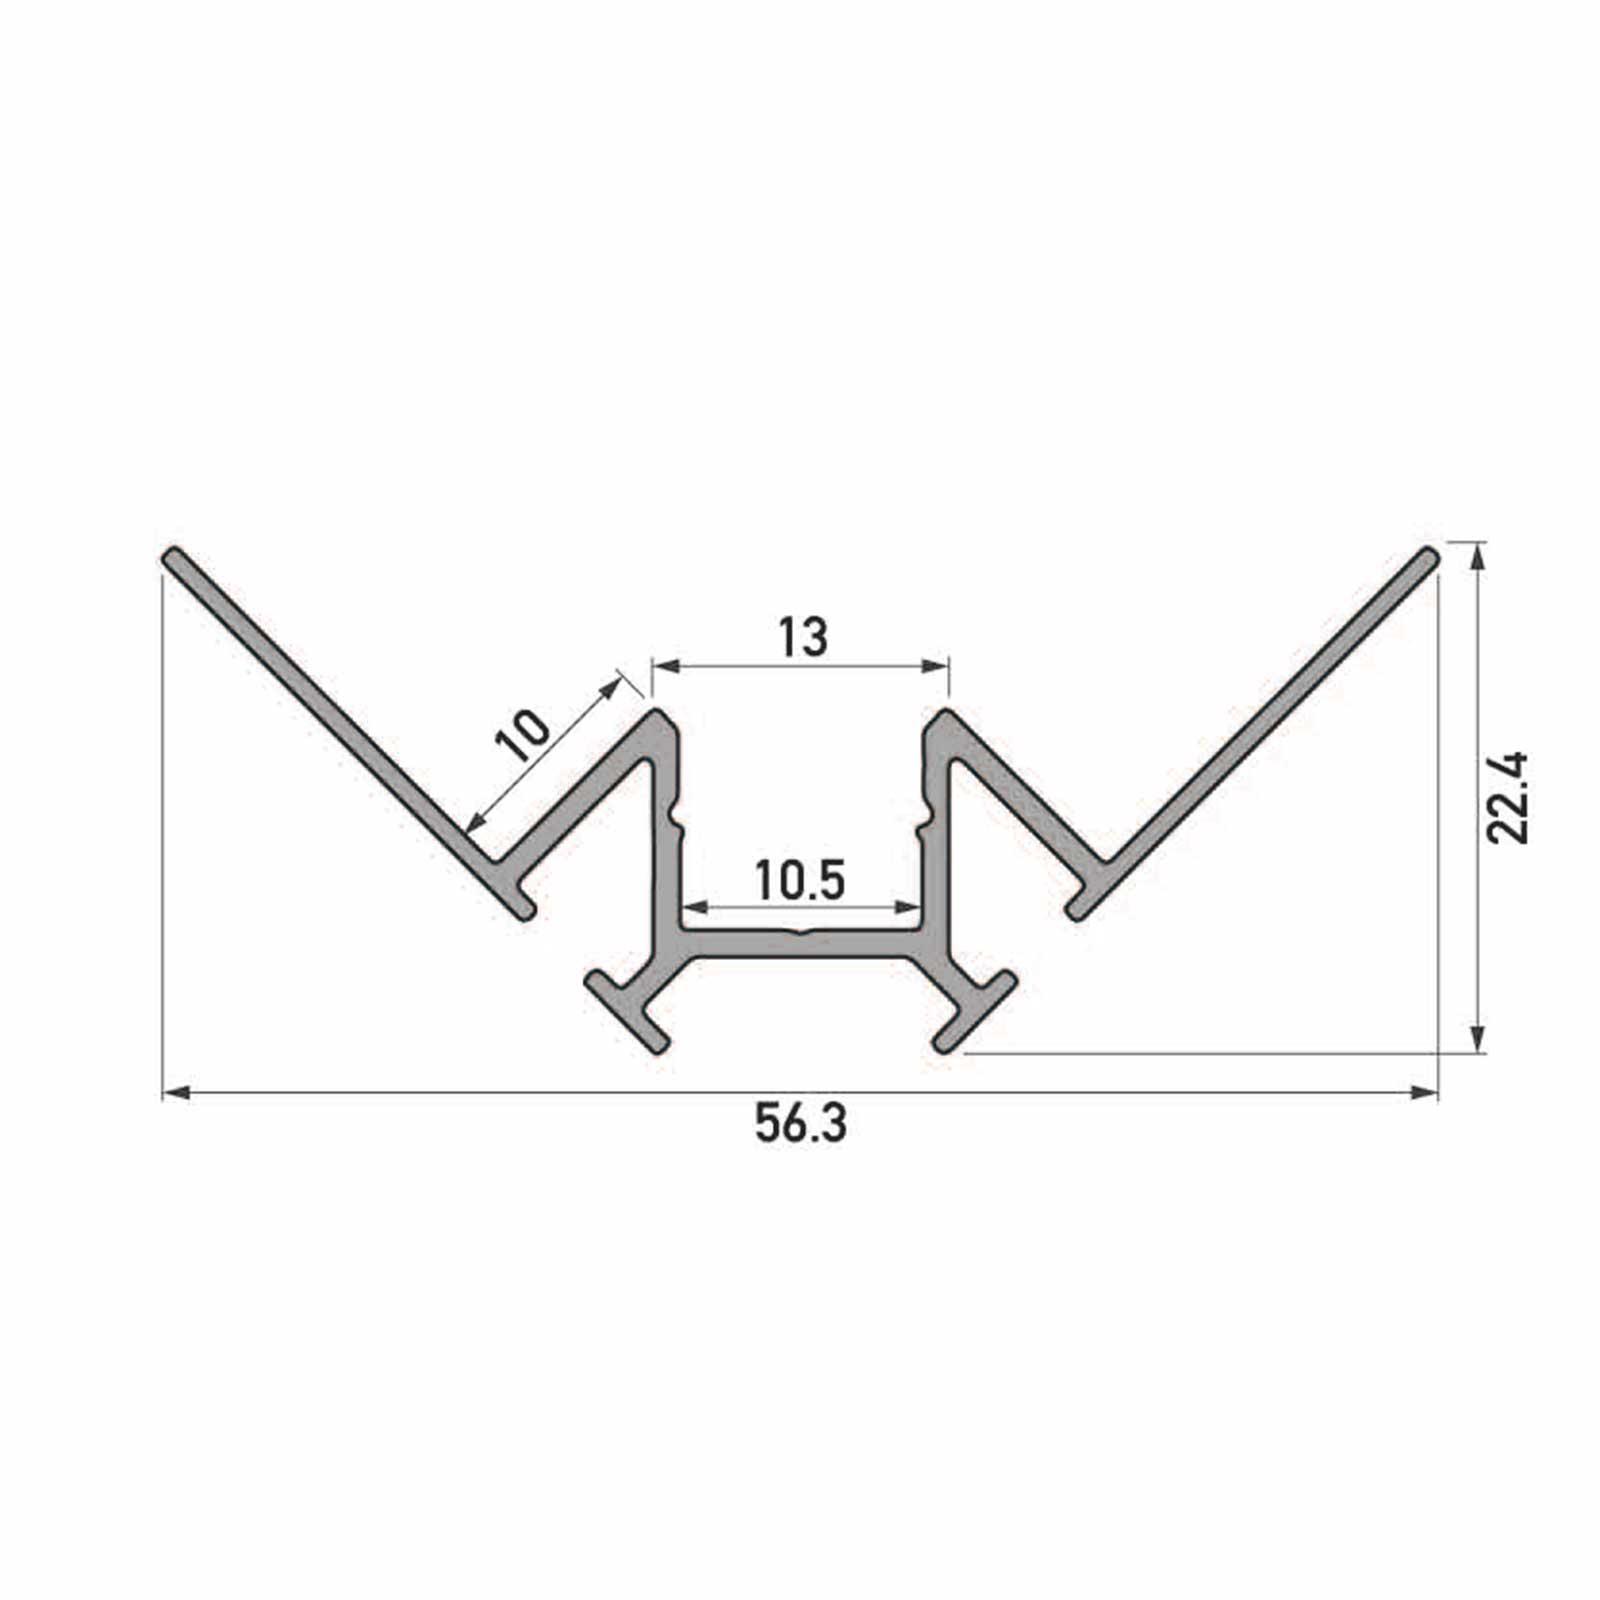 Skizze 2 Meter LED Inneneck-Aluprofil TARA (TA) für Trockenbau Rigipswand Fliesenspigel